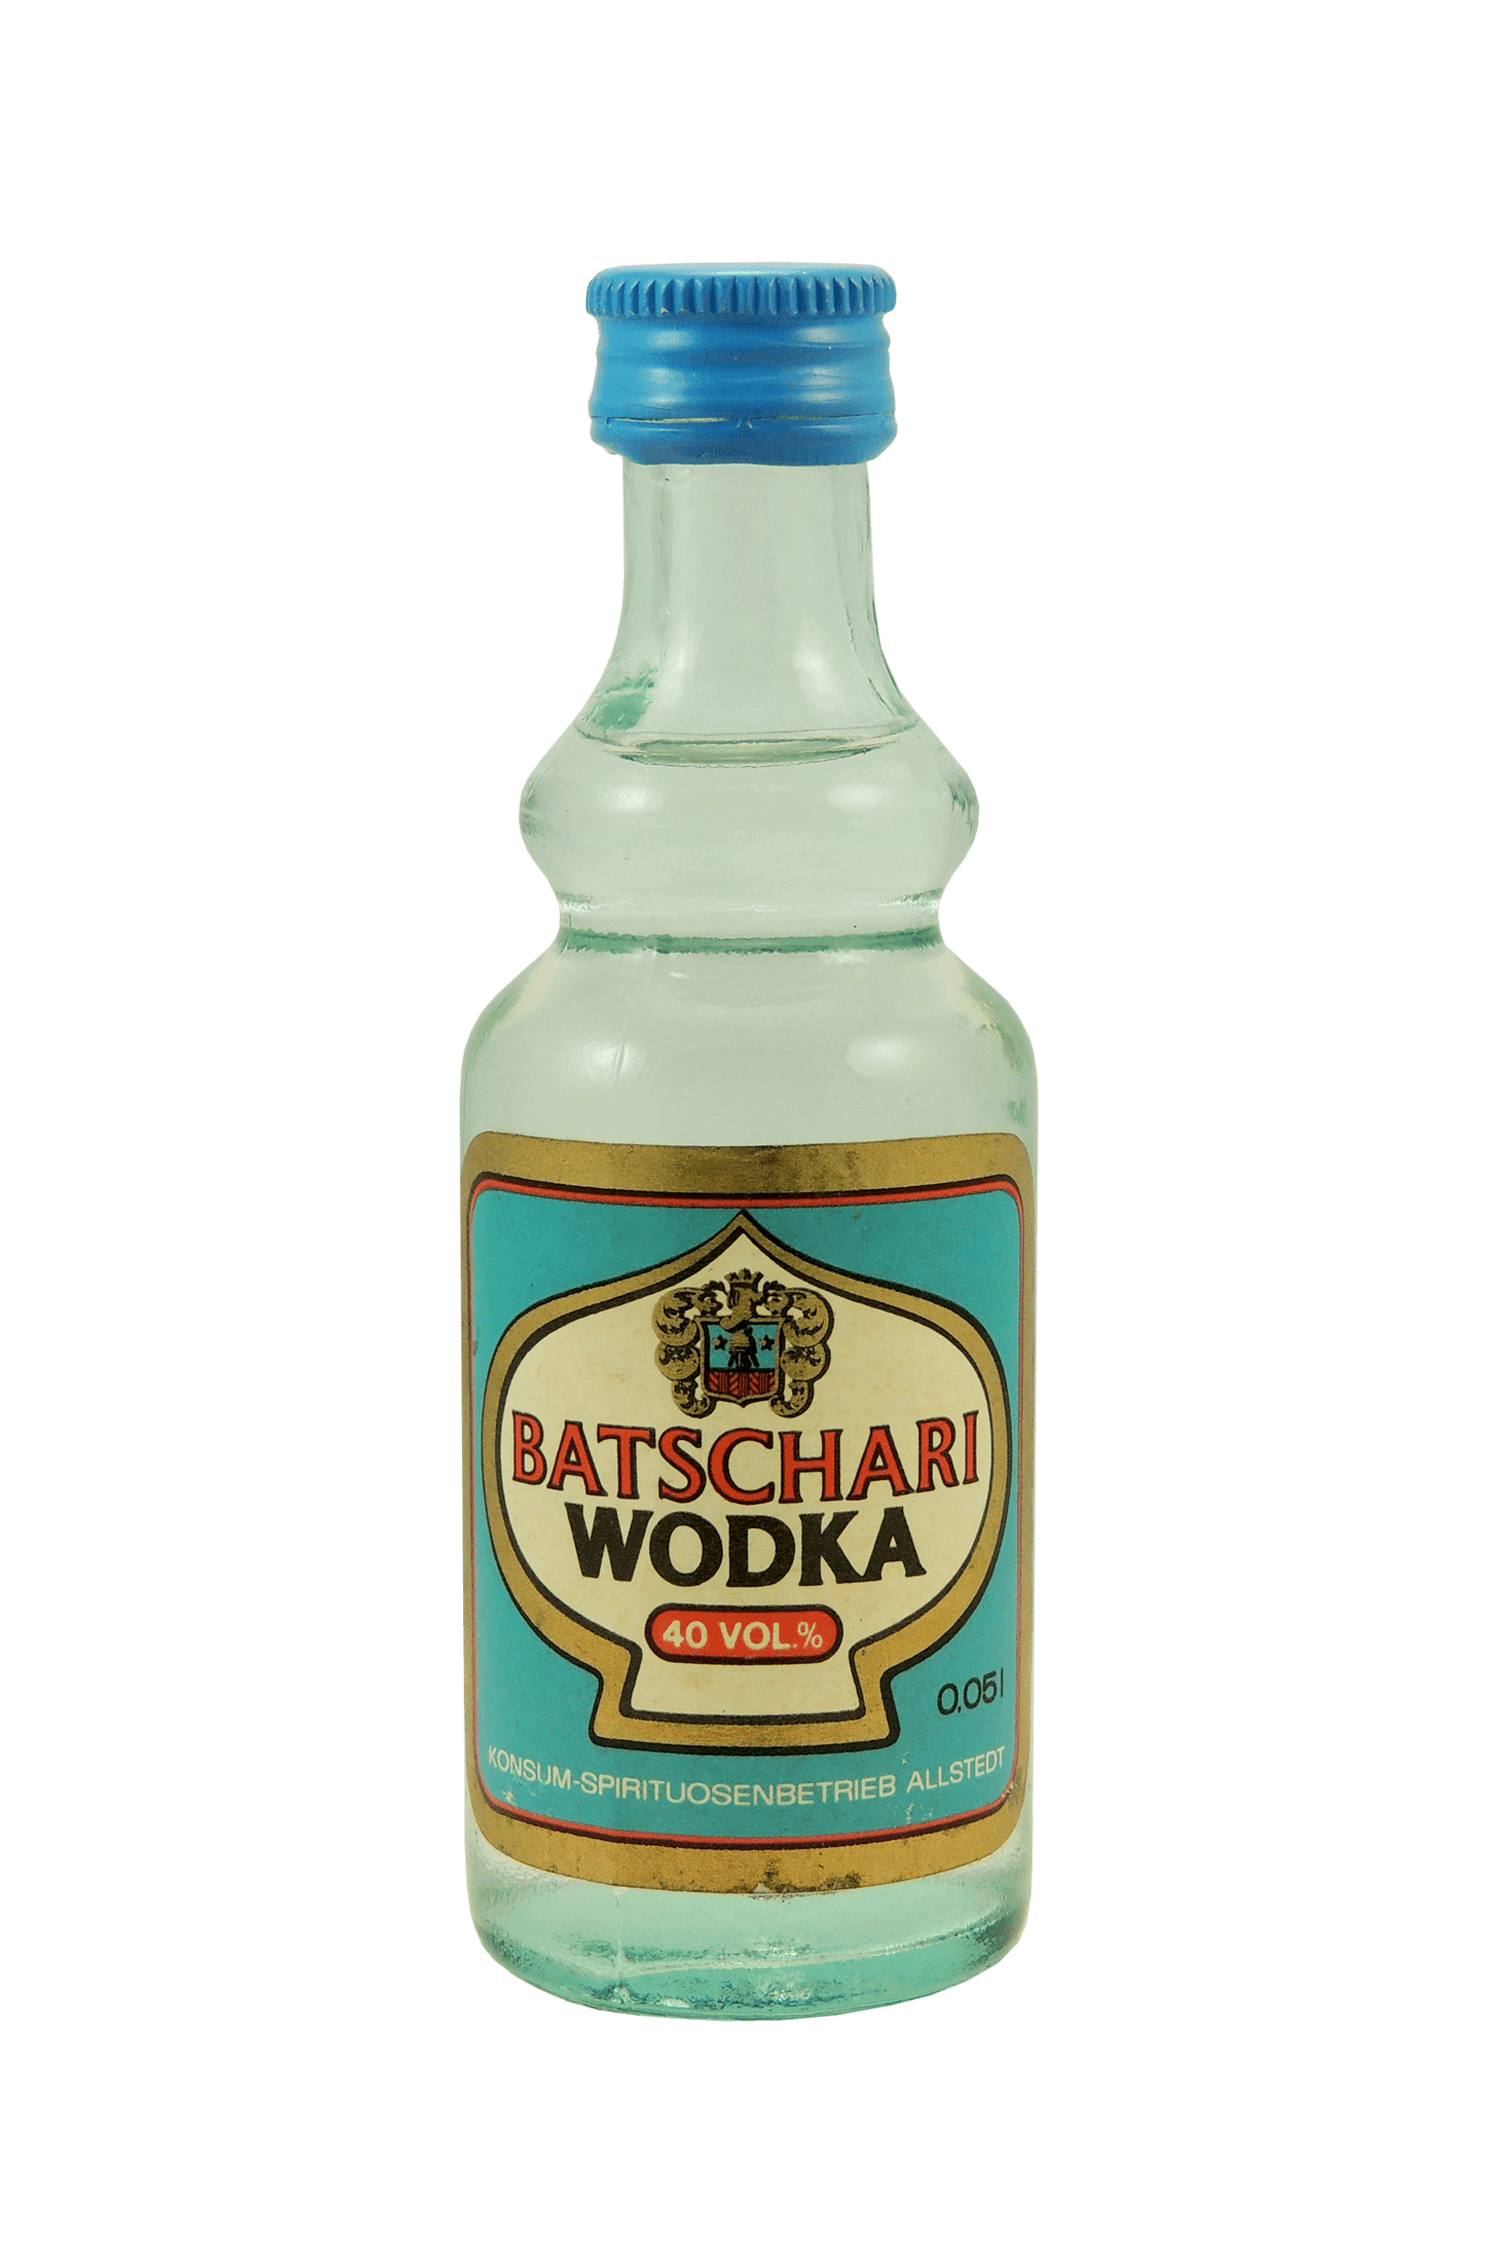 Batschari Wodka